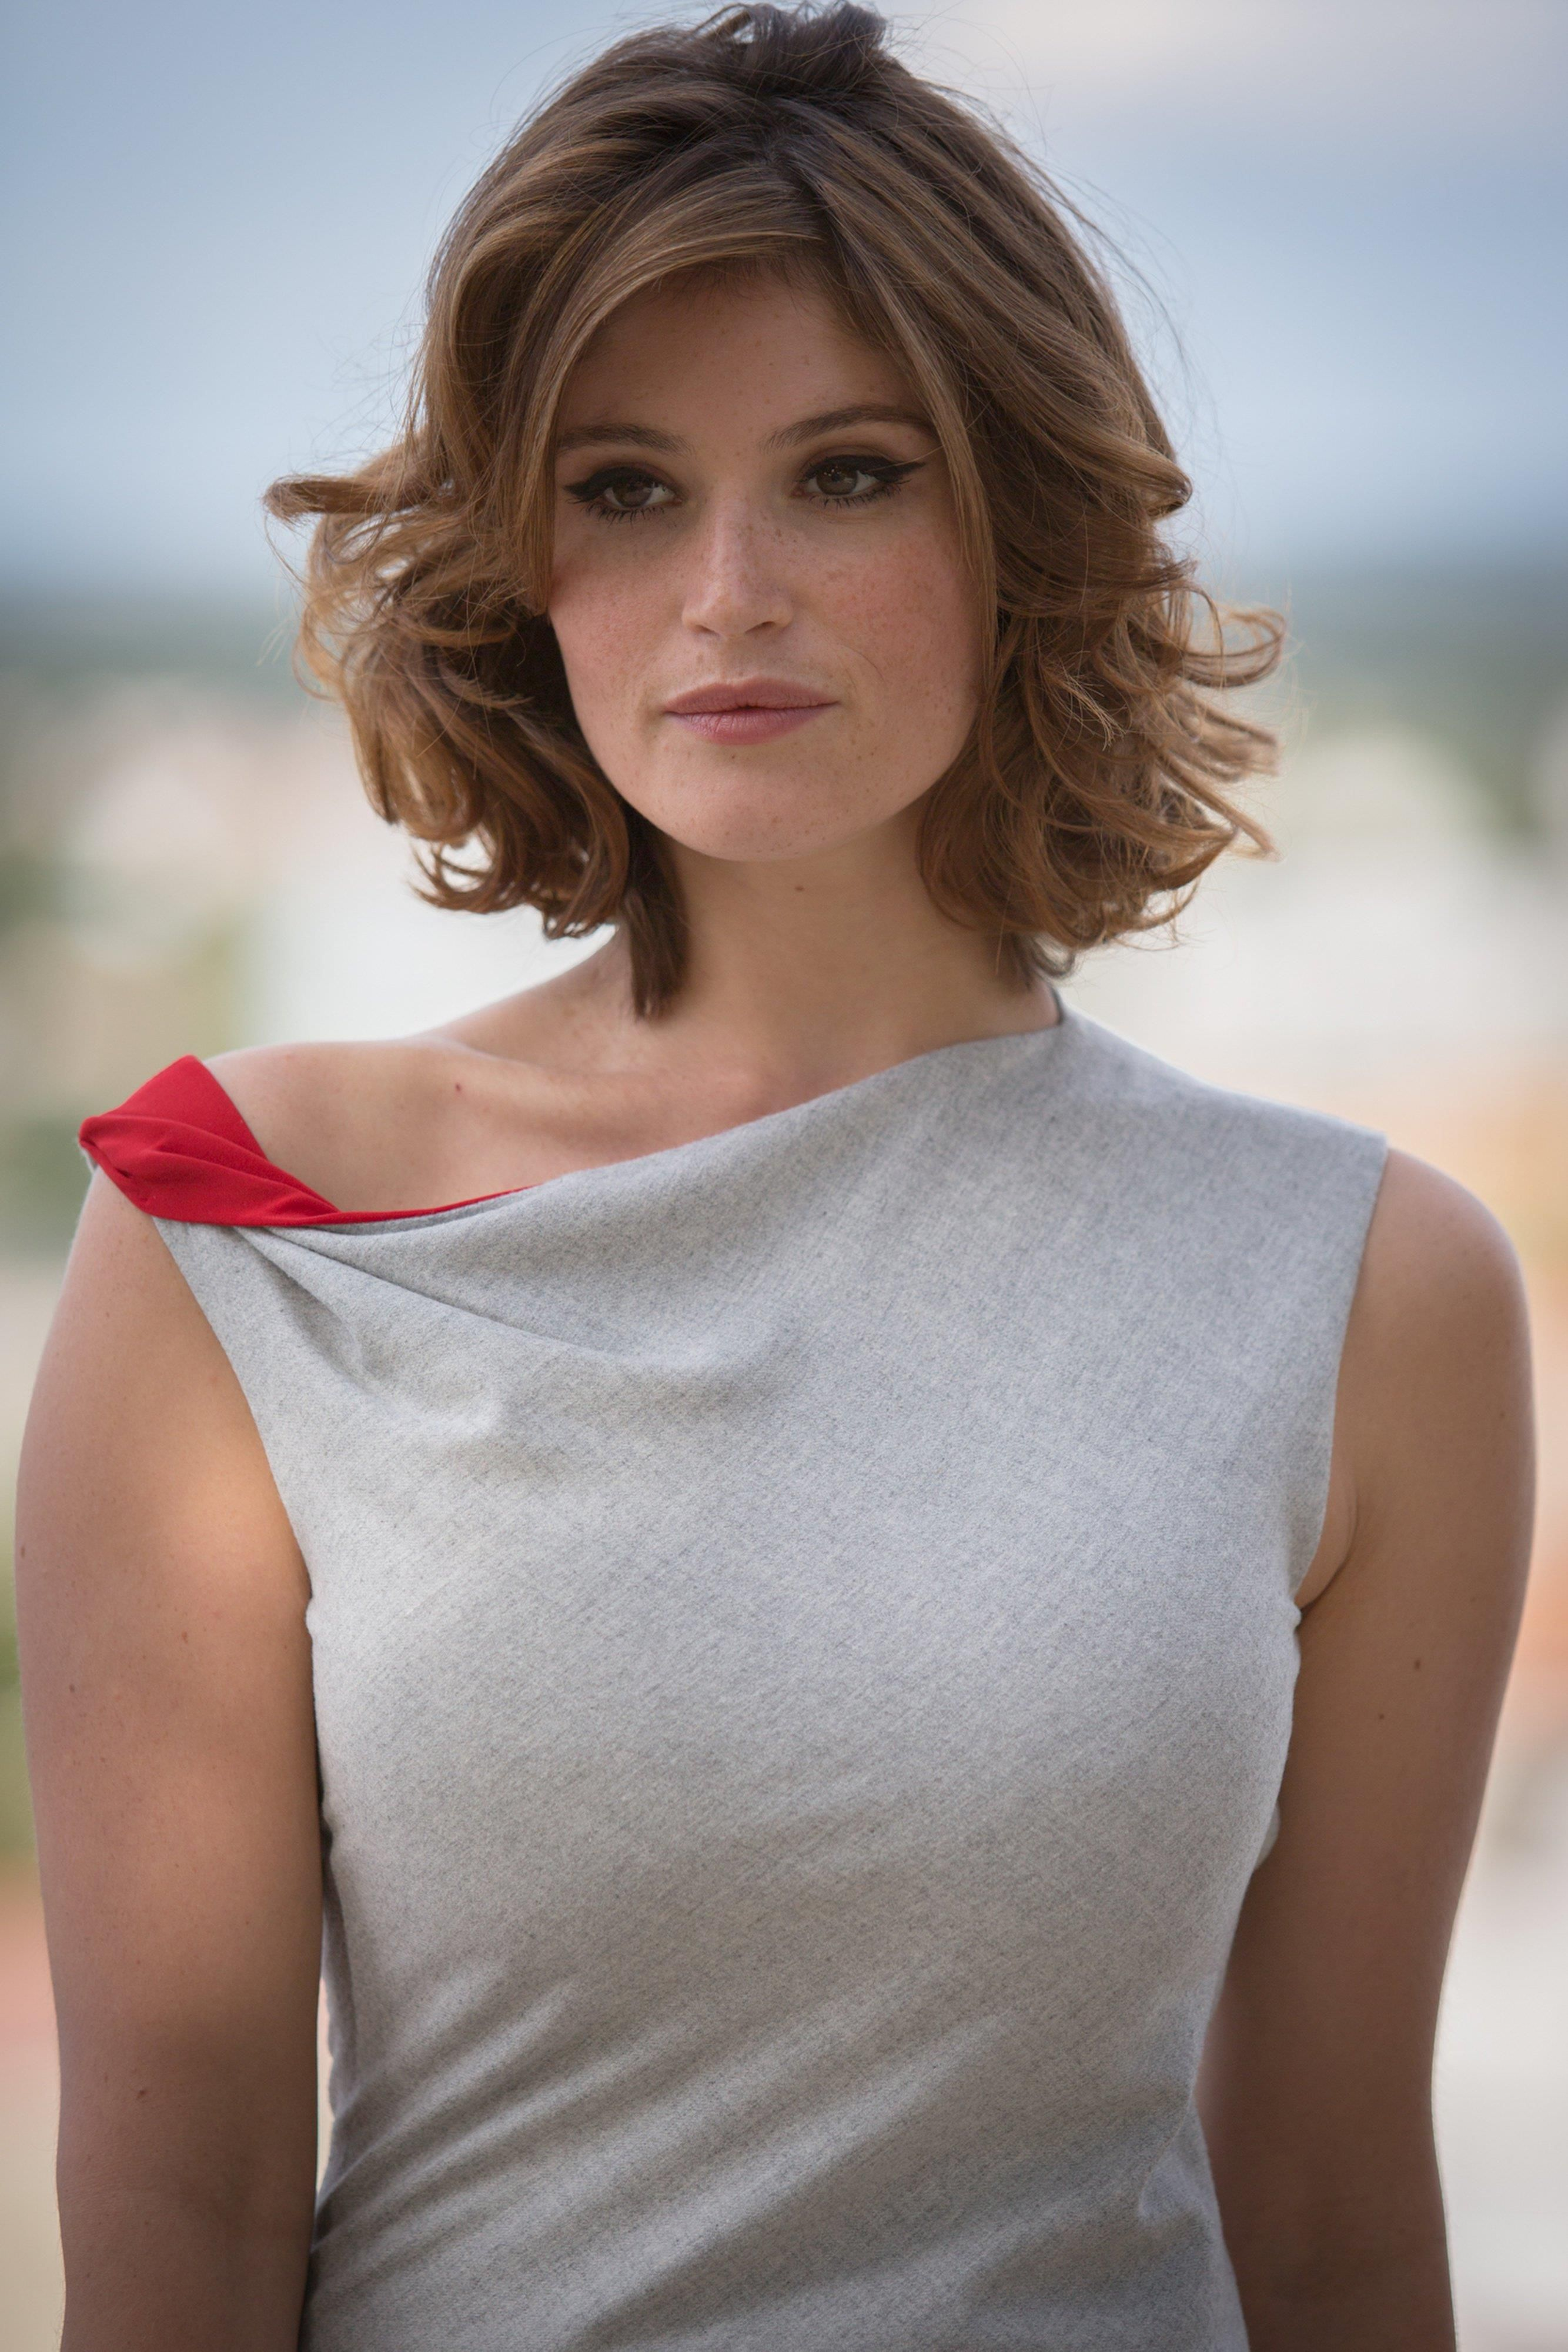 Susy Kane (born 1978),Abigail Lawrie Hot video Charlotte McKinney,Tracey Ellis